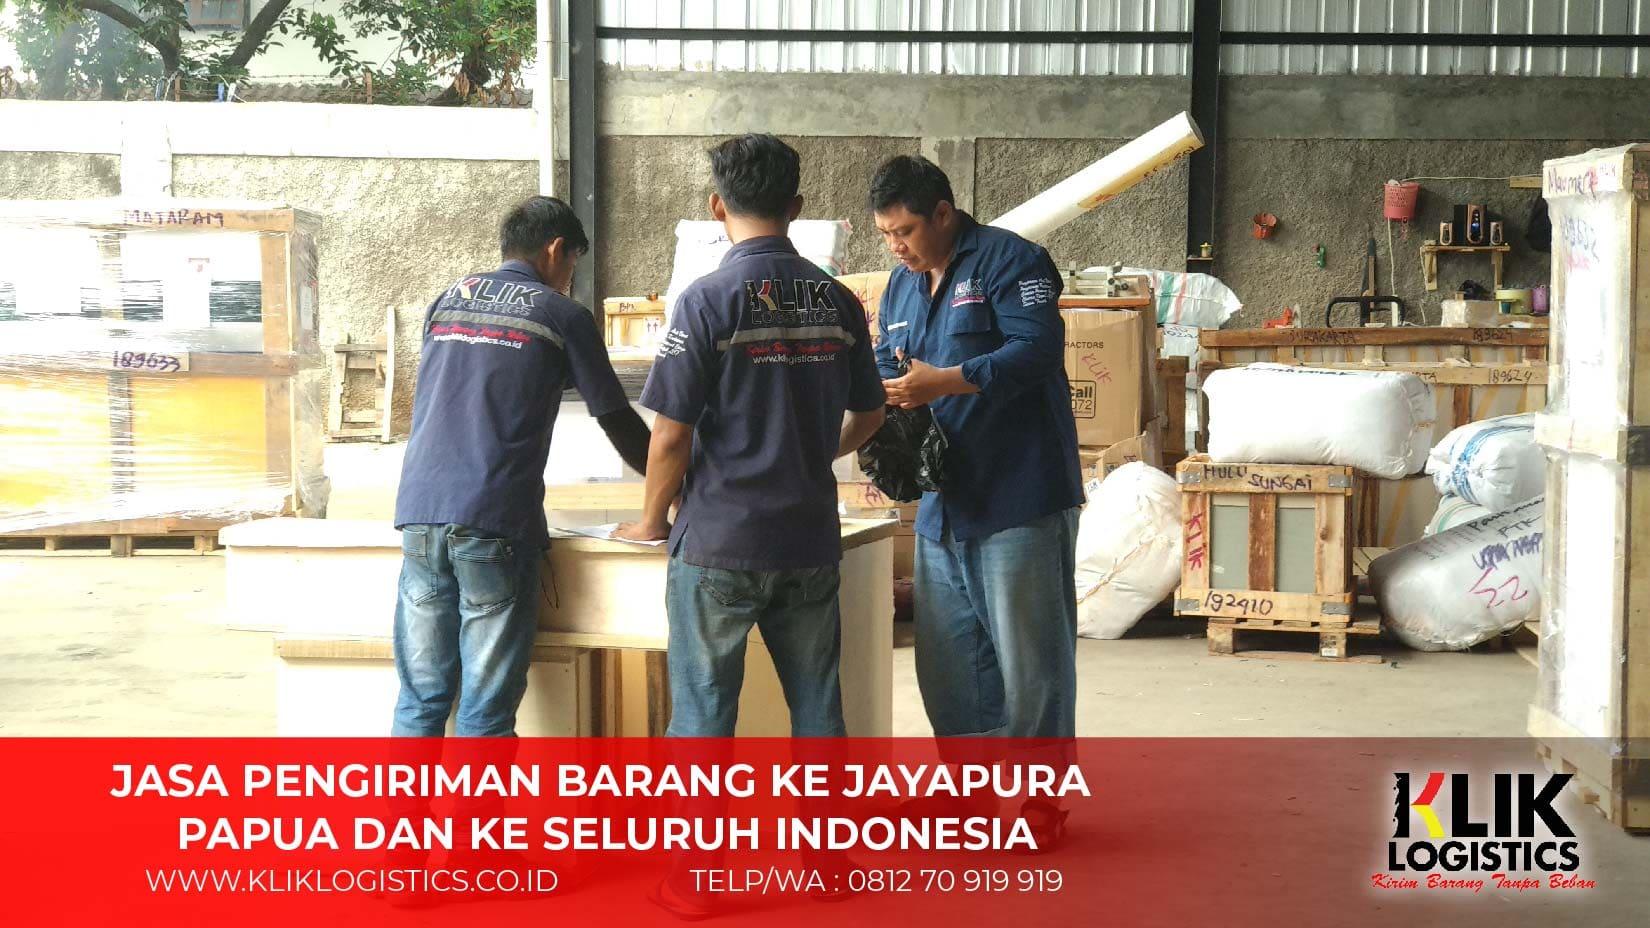 Jasa Pengiriman Barang ke Jayapura Papua - Klik Logistics